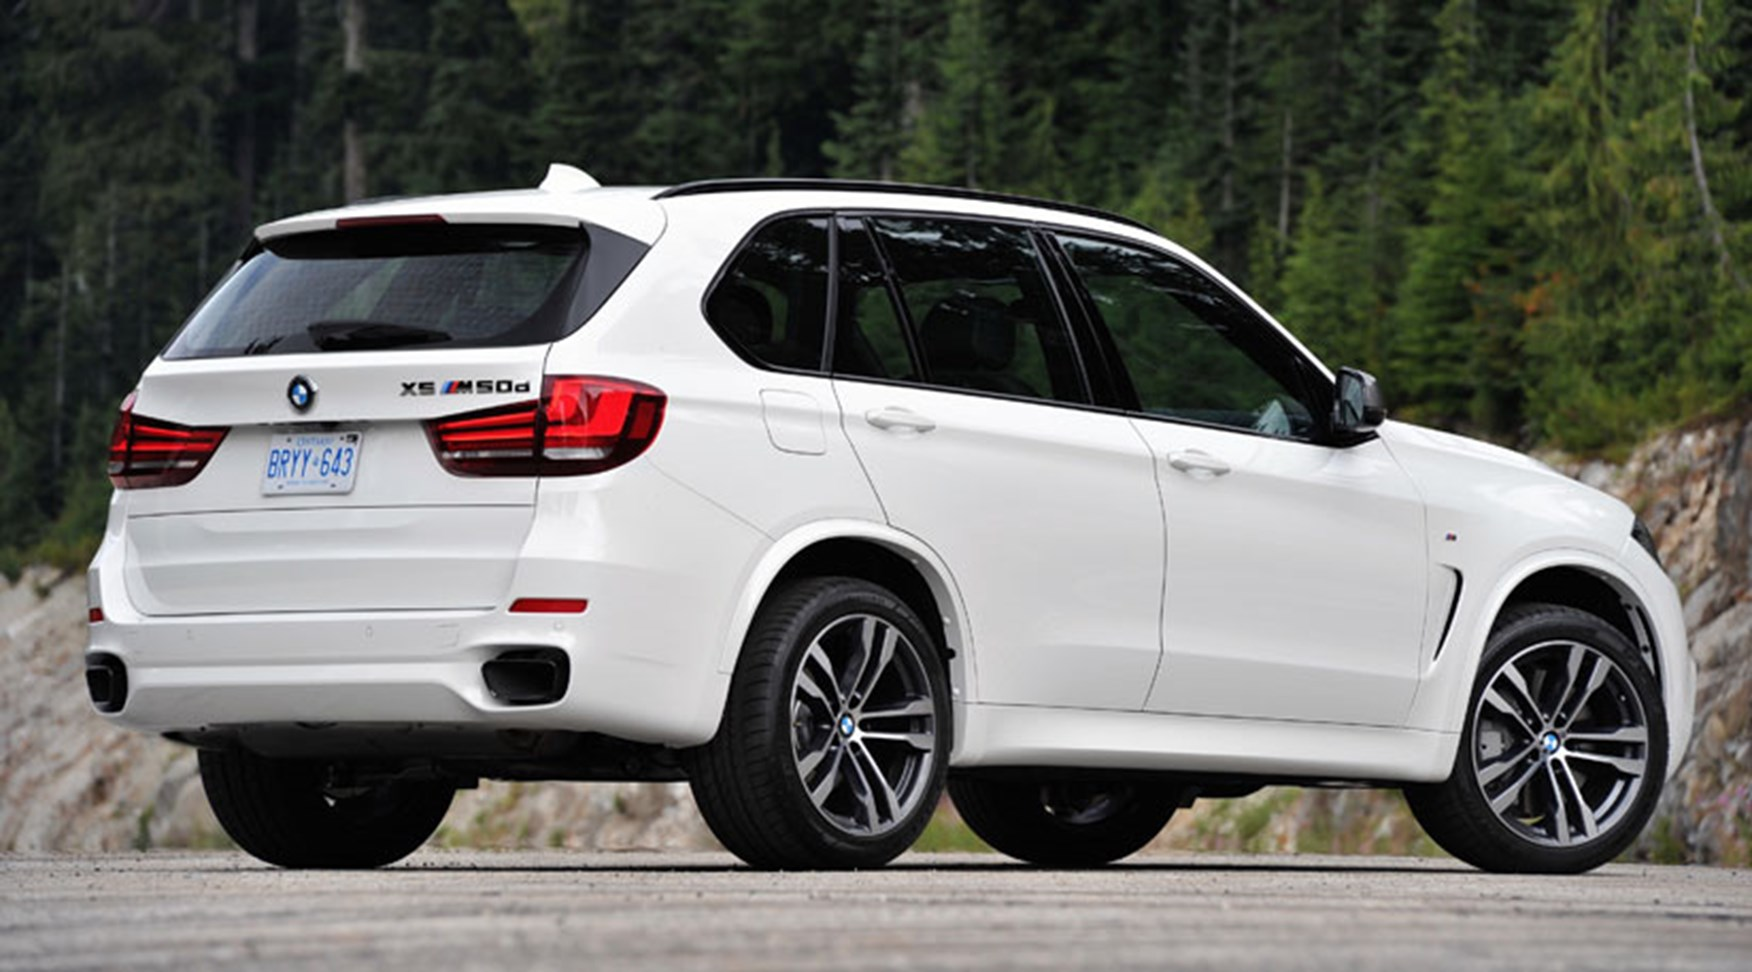 Bmw X5 M50d Xdrive 2014 Review By Car Magazine Autos Post